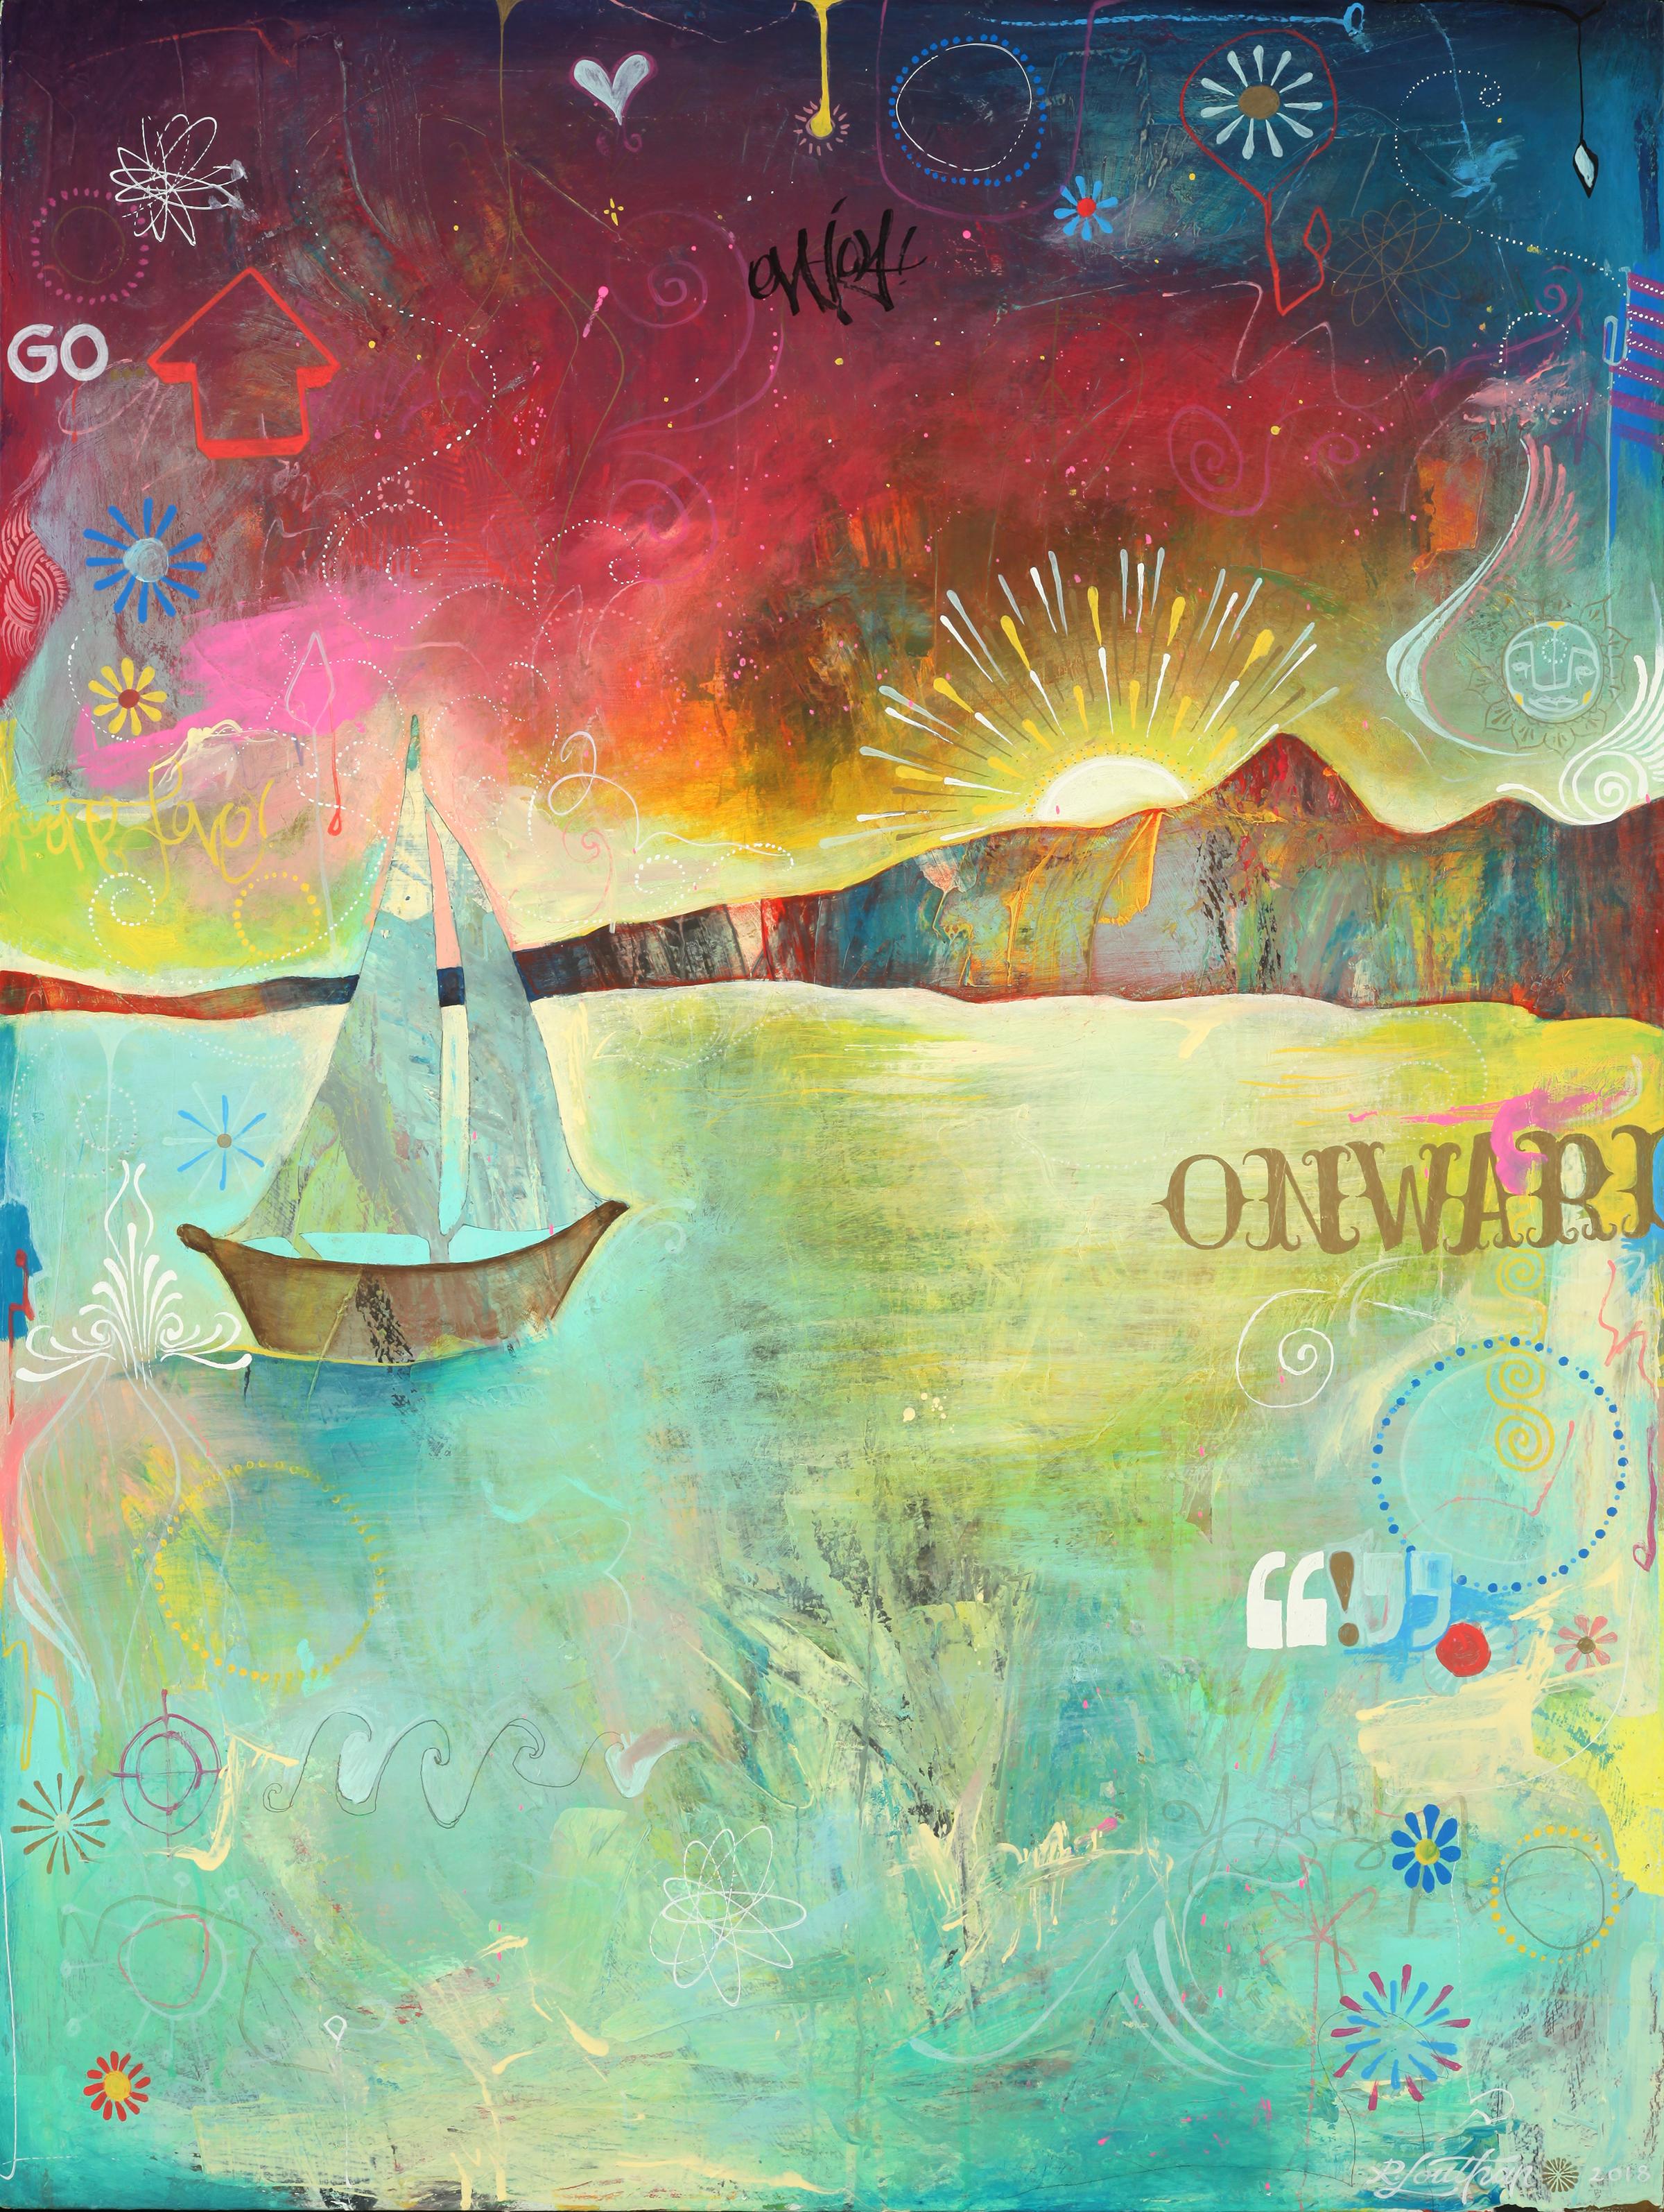 "'We Float Econo' Acrylic on canvas. 30""x40"". 2018"